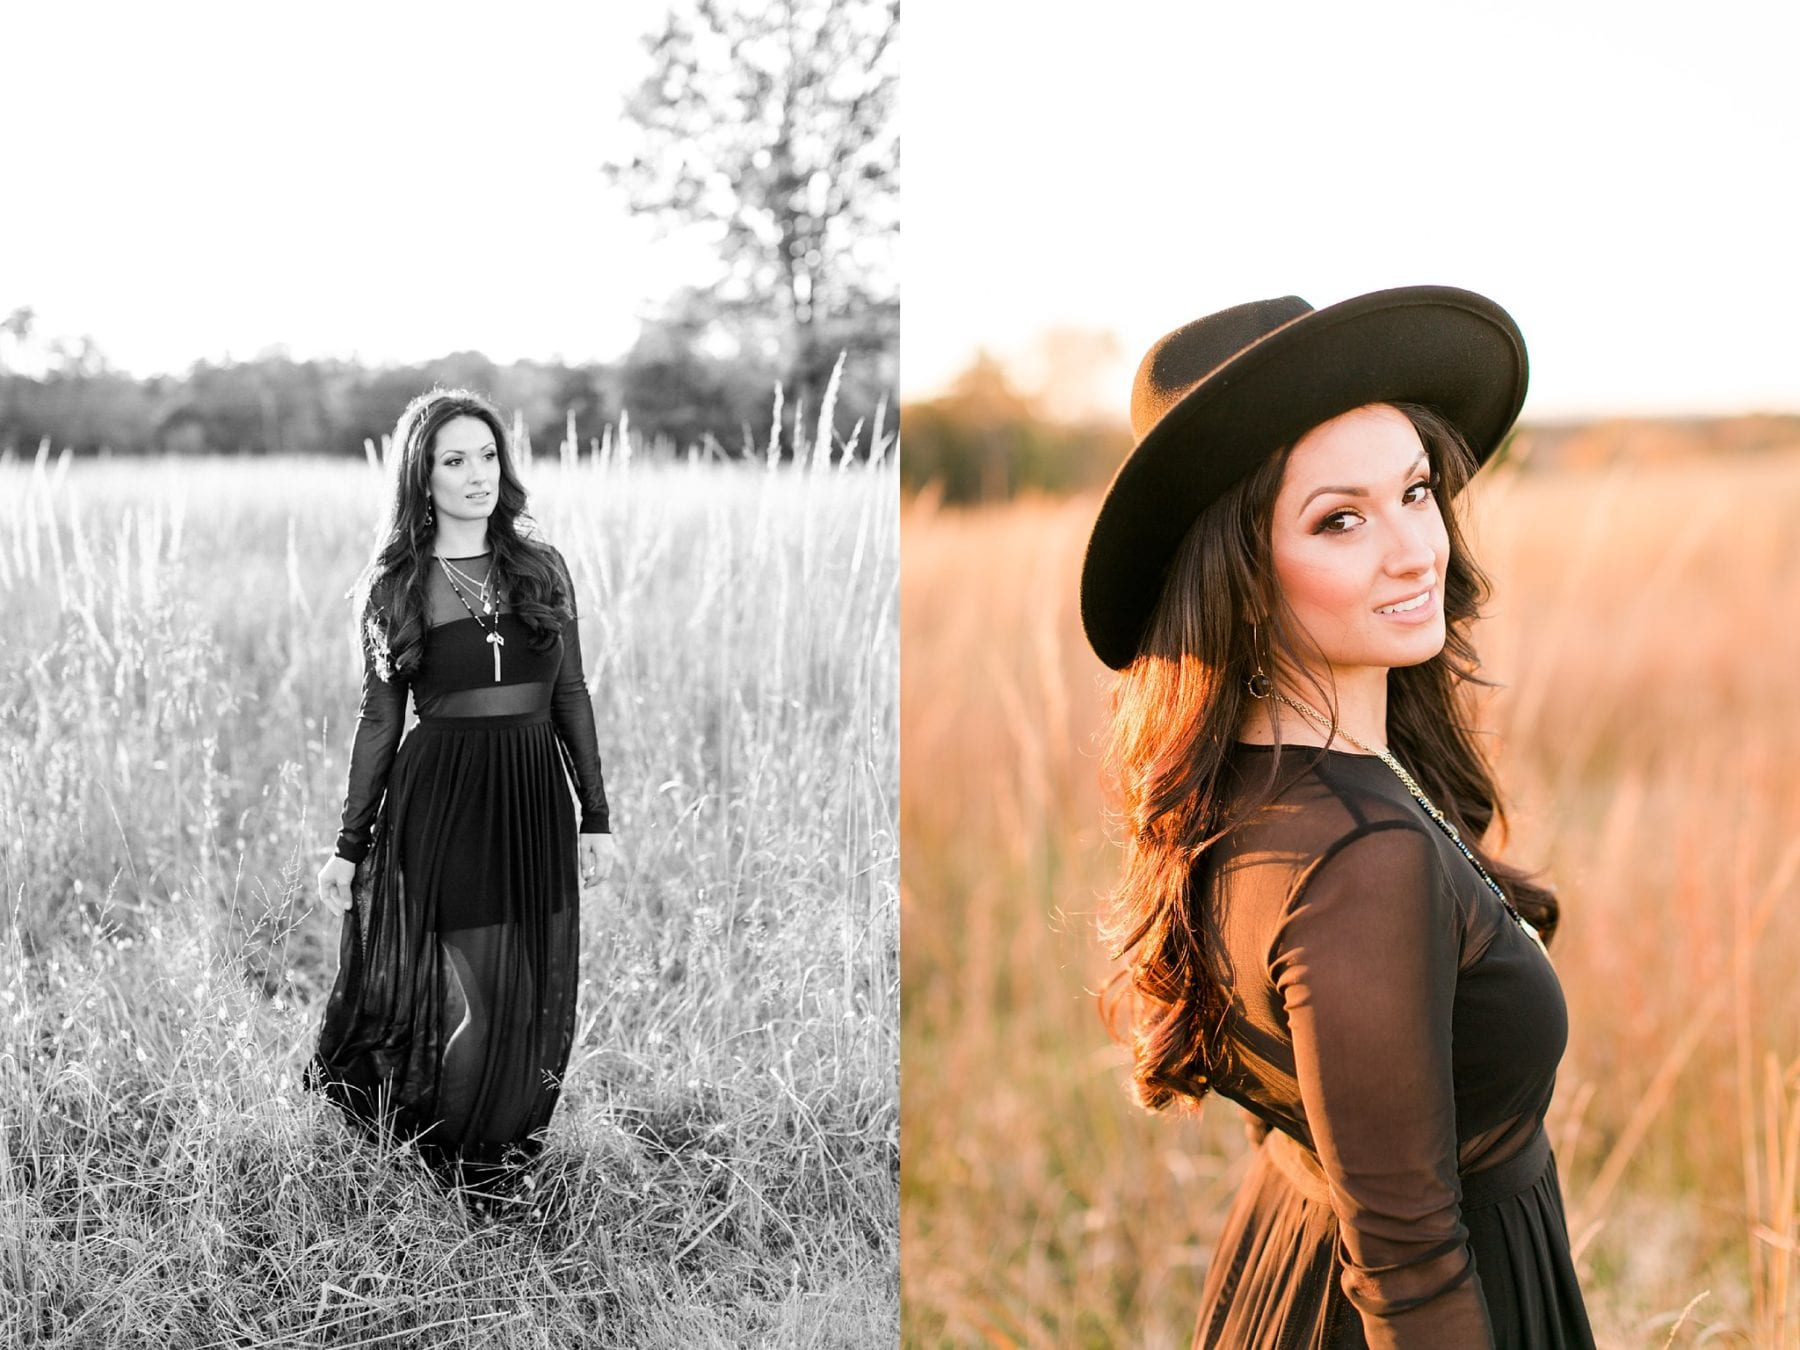 Manassas Battlefield Portraits Virginia Wedding Photographer Megan Kelsey Photography Lianne & Chris-261.jpg